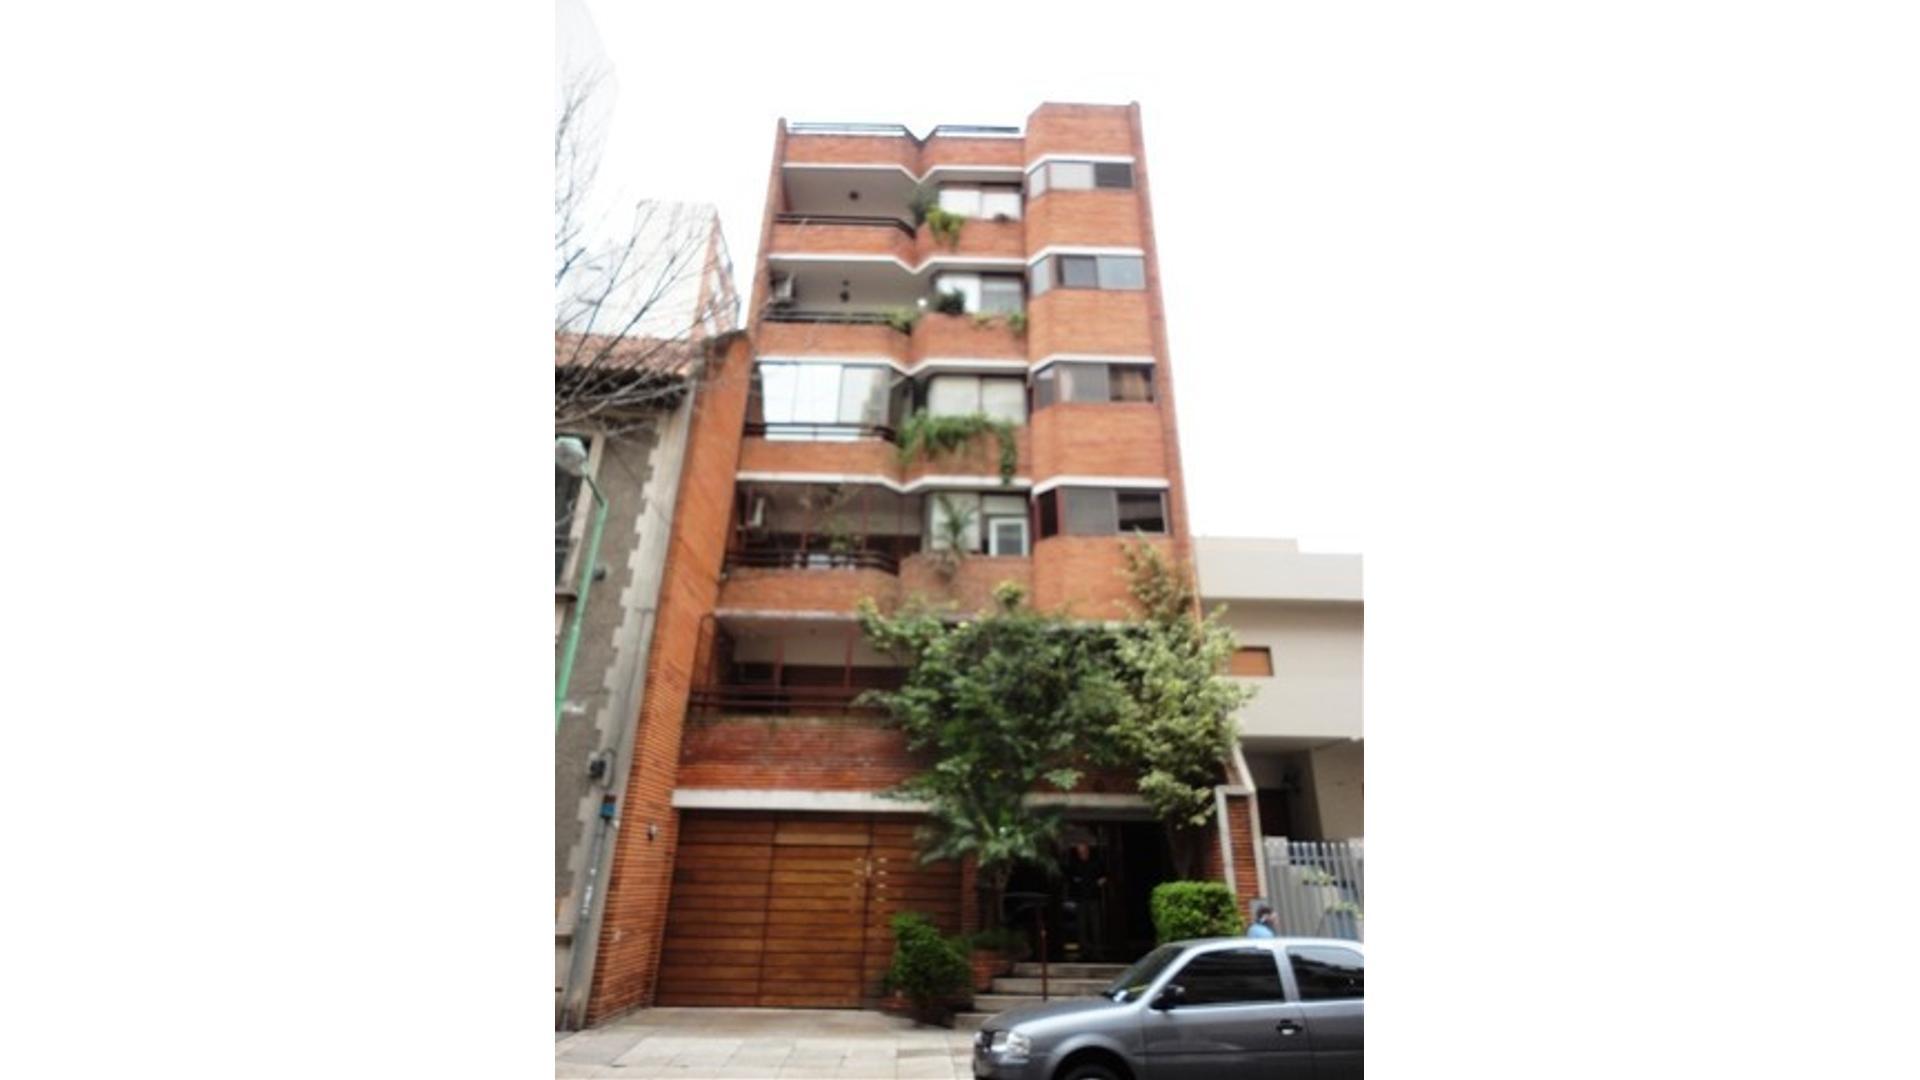 Departamento - Venta - Argentina, Capital Federal - AMENABAR 2869